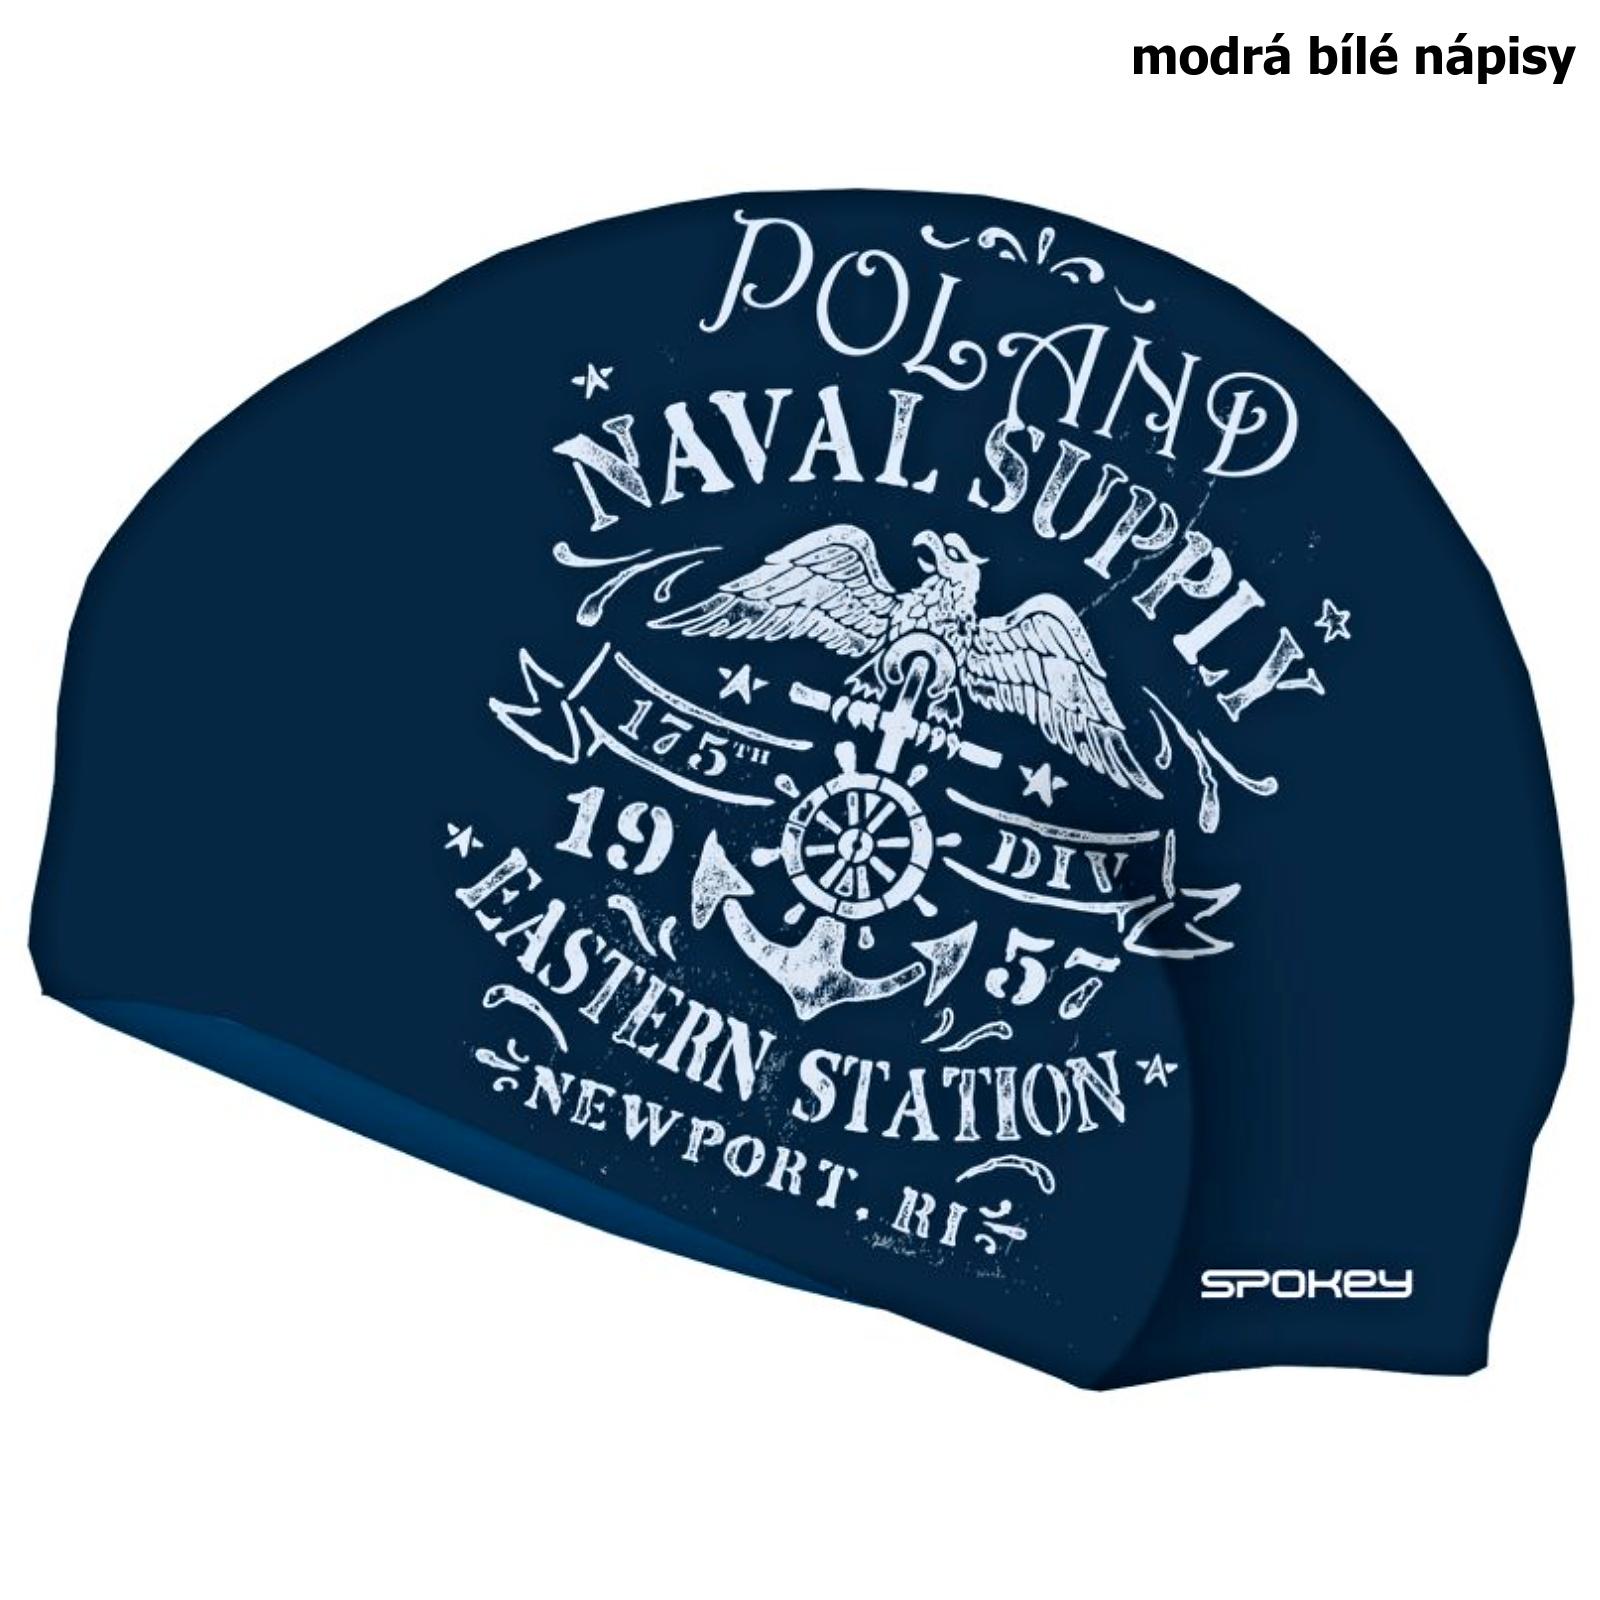 Plavecká čiapka SPOKEY Stylo - modrá biele nápisy